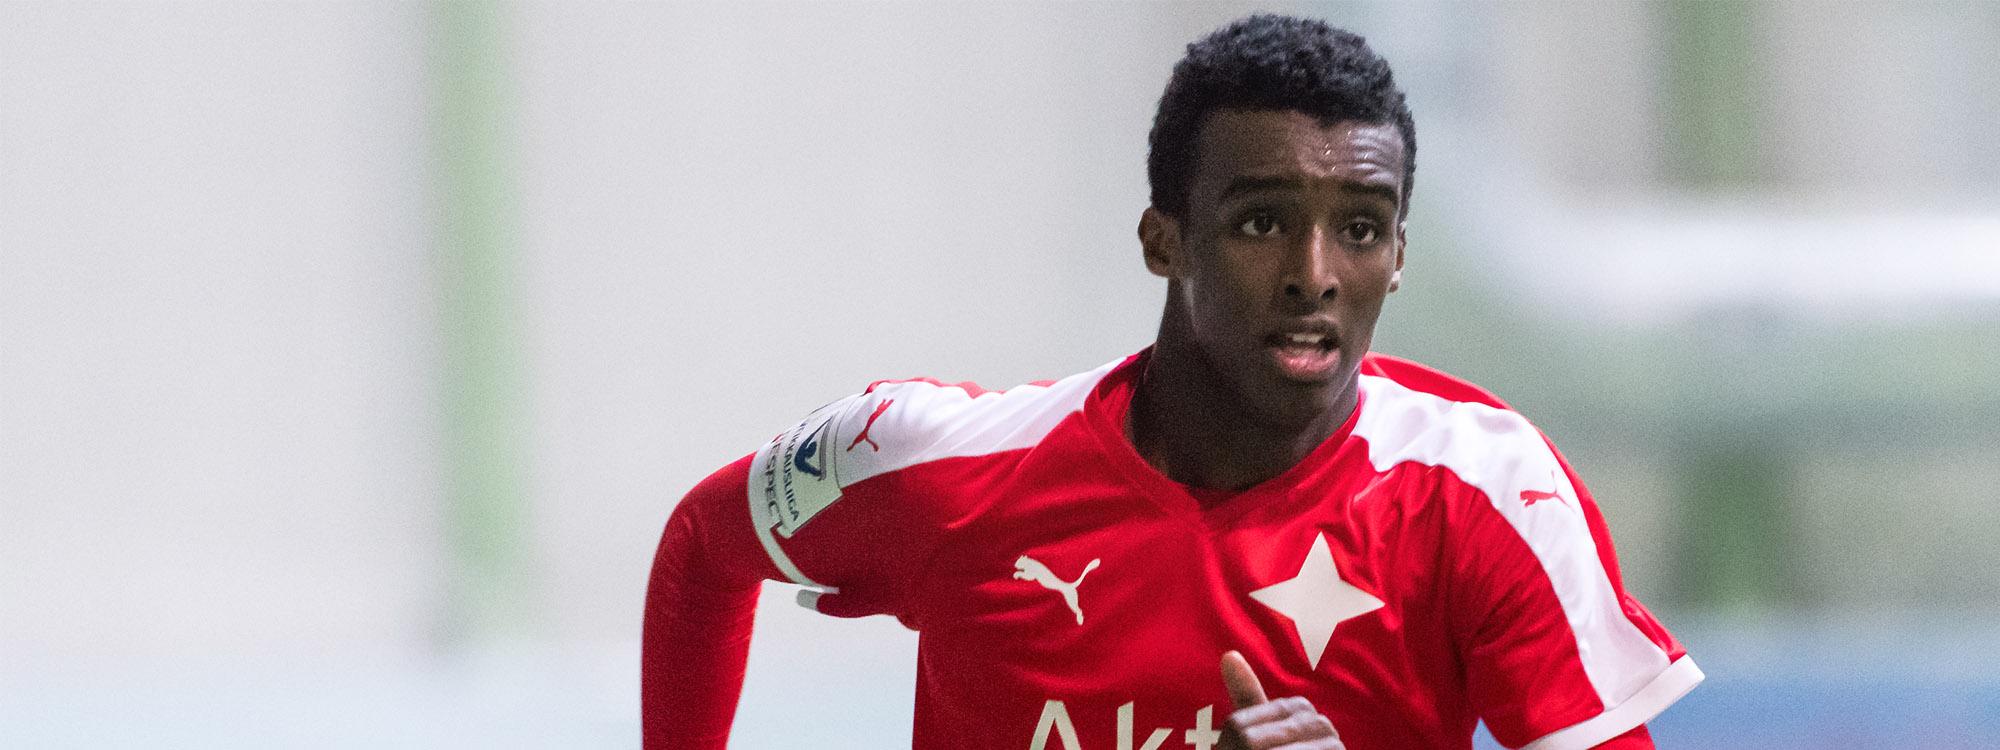 HIFK Play: Abaas Ismail odottaa liigakauden alkua